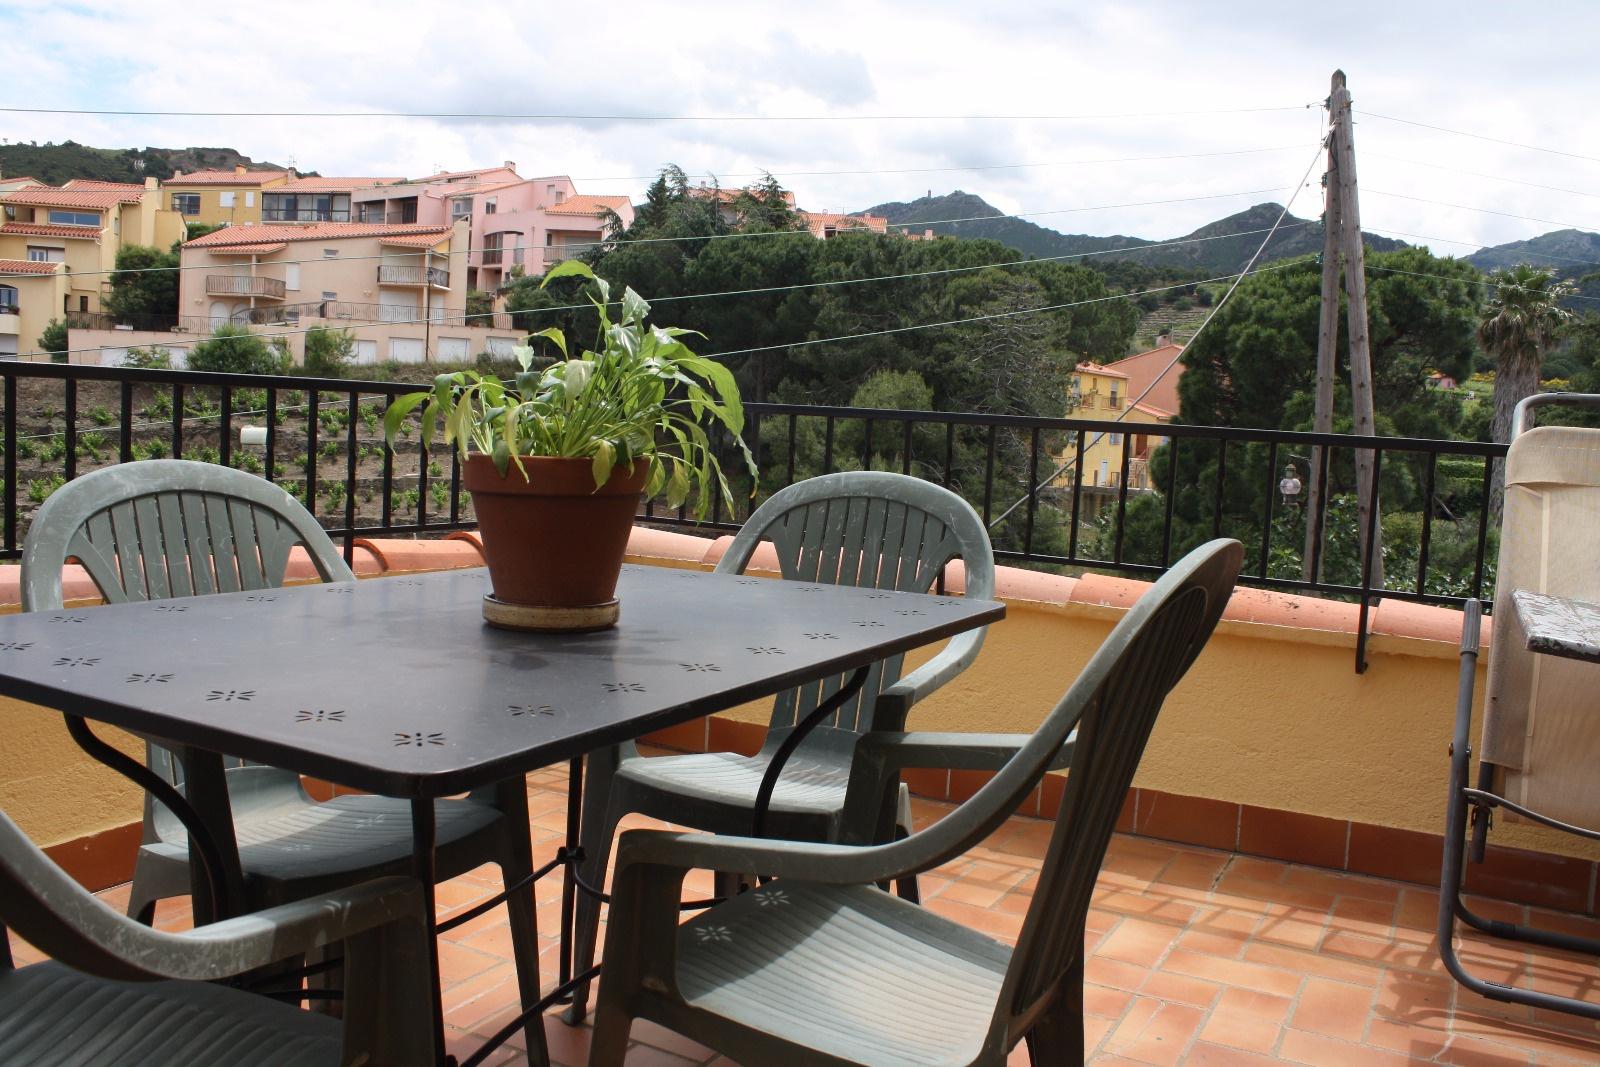 Vente maison collioure avec barrio immobilier for Acheter maison collioure